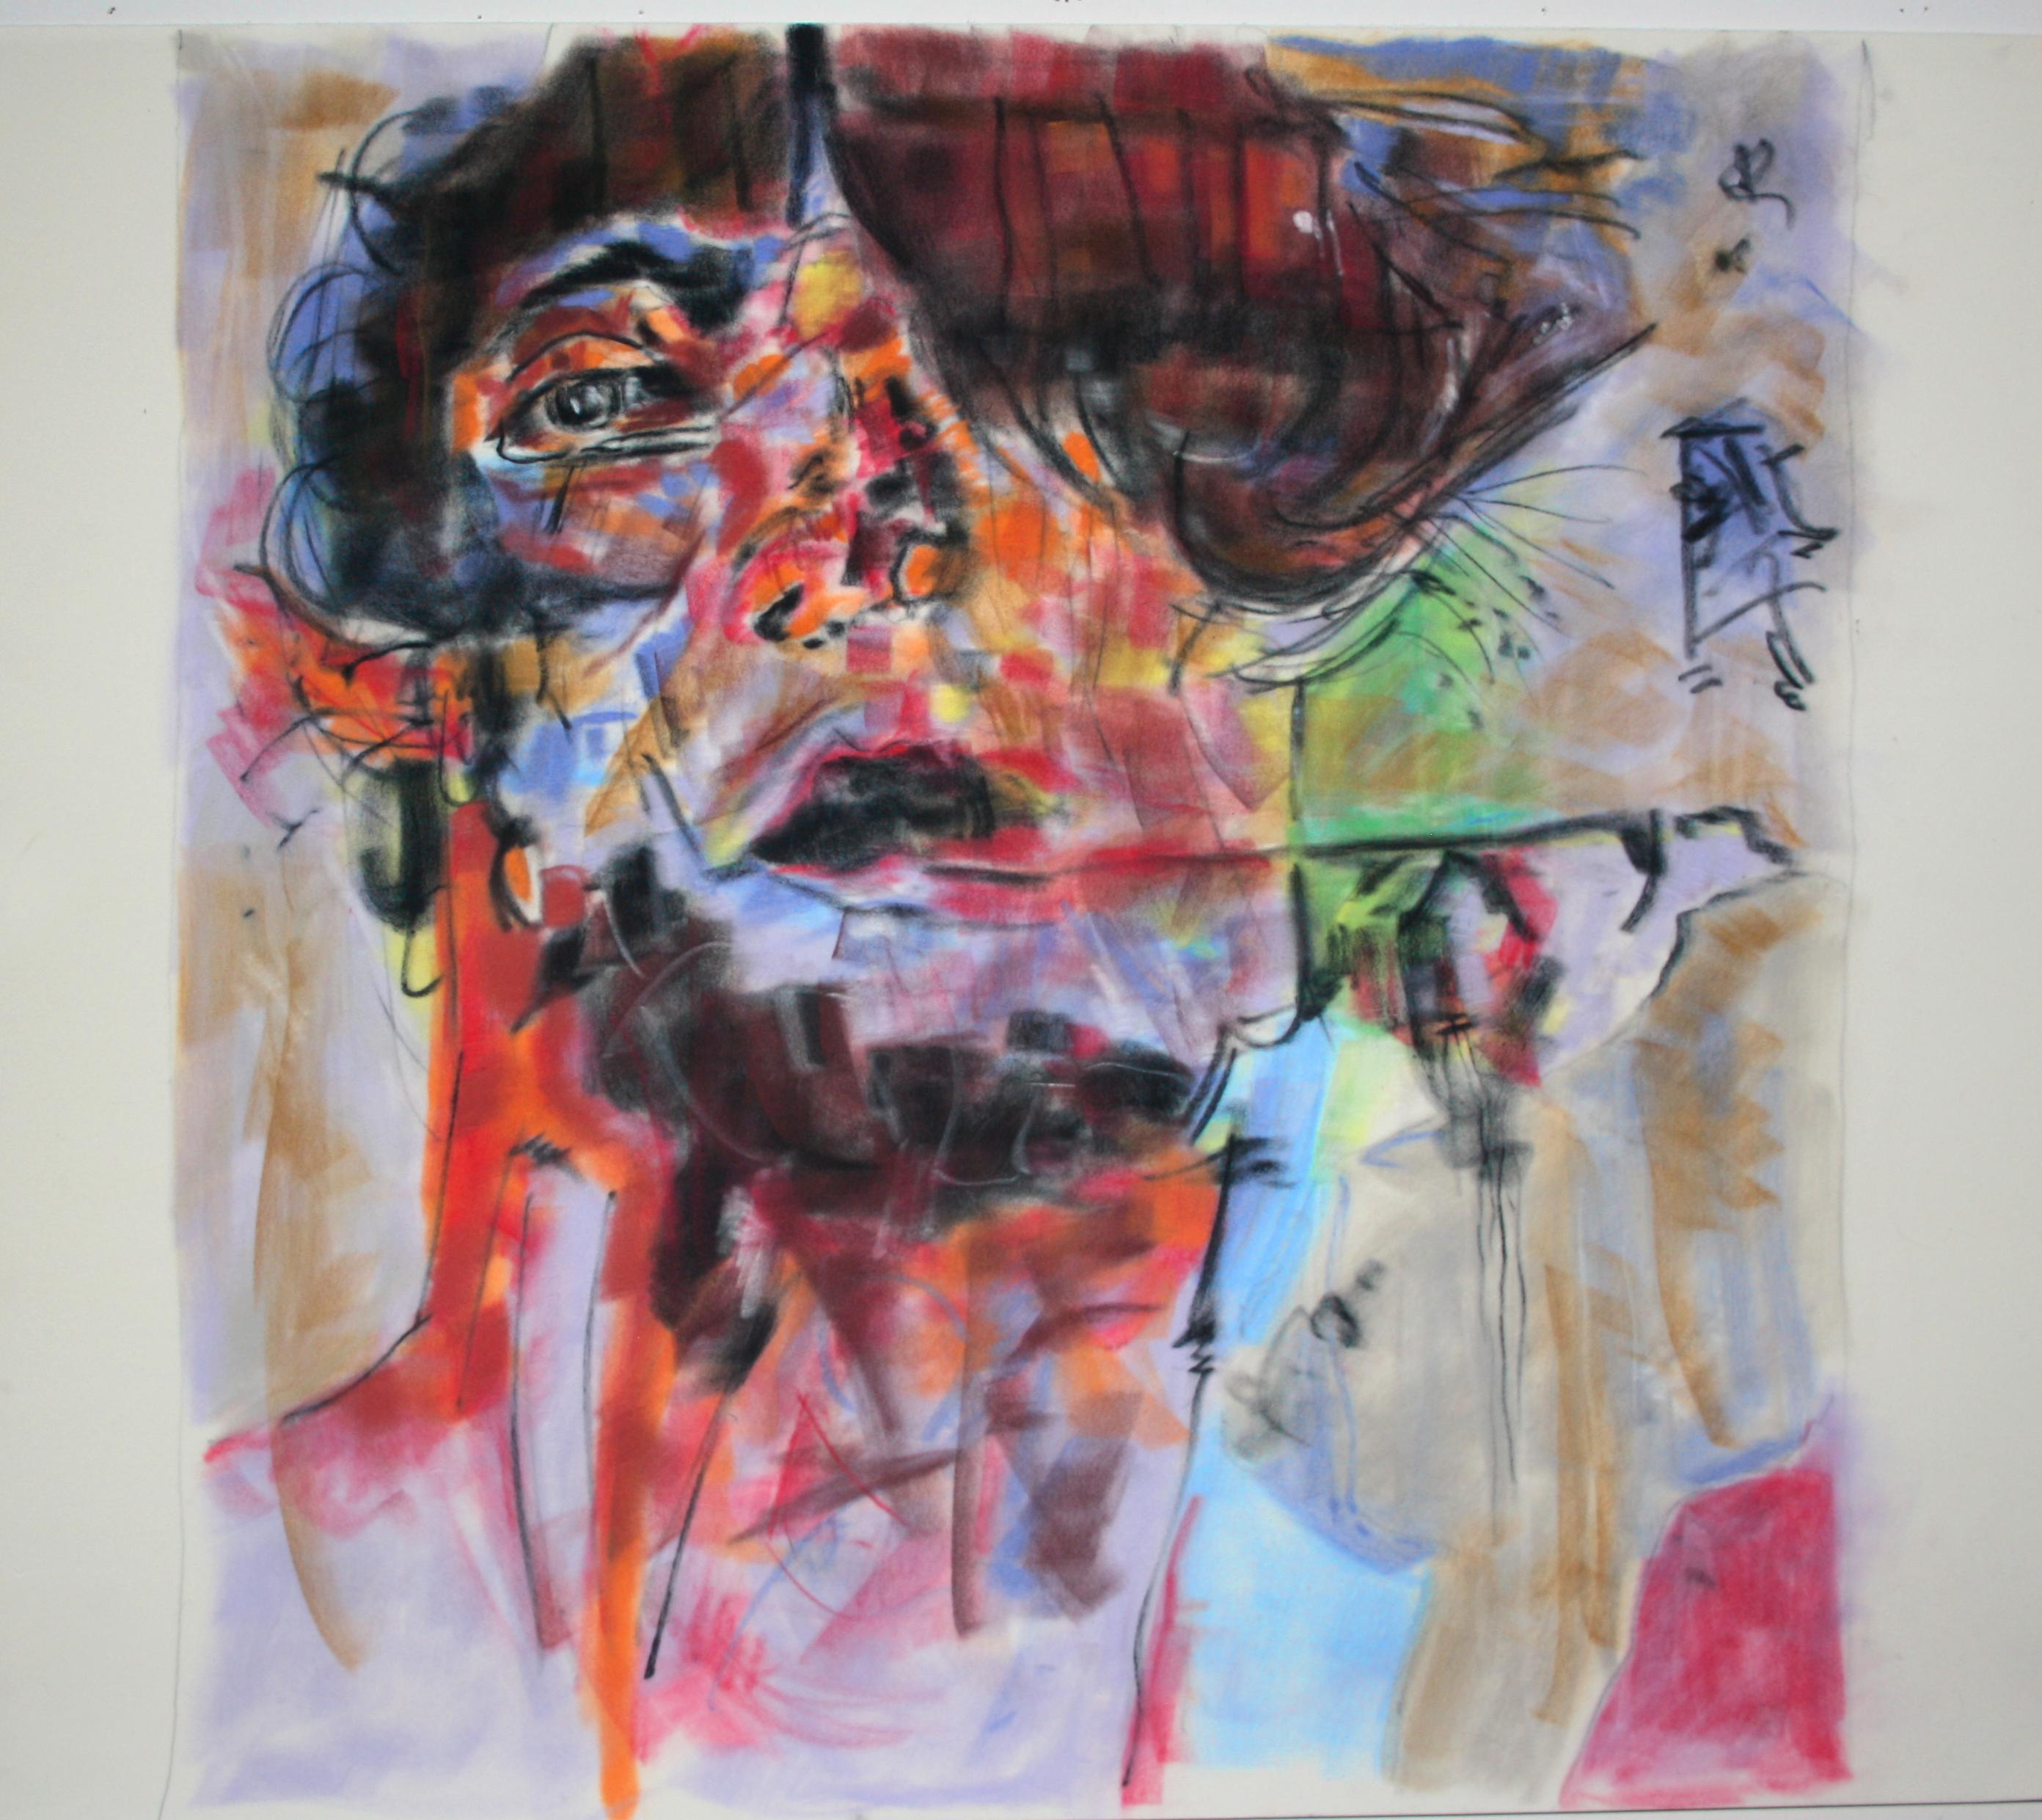 ART FACE N°53